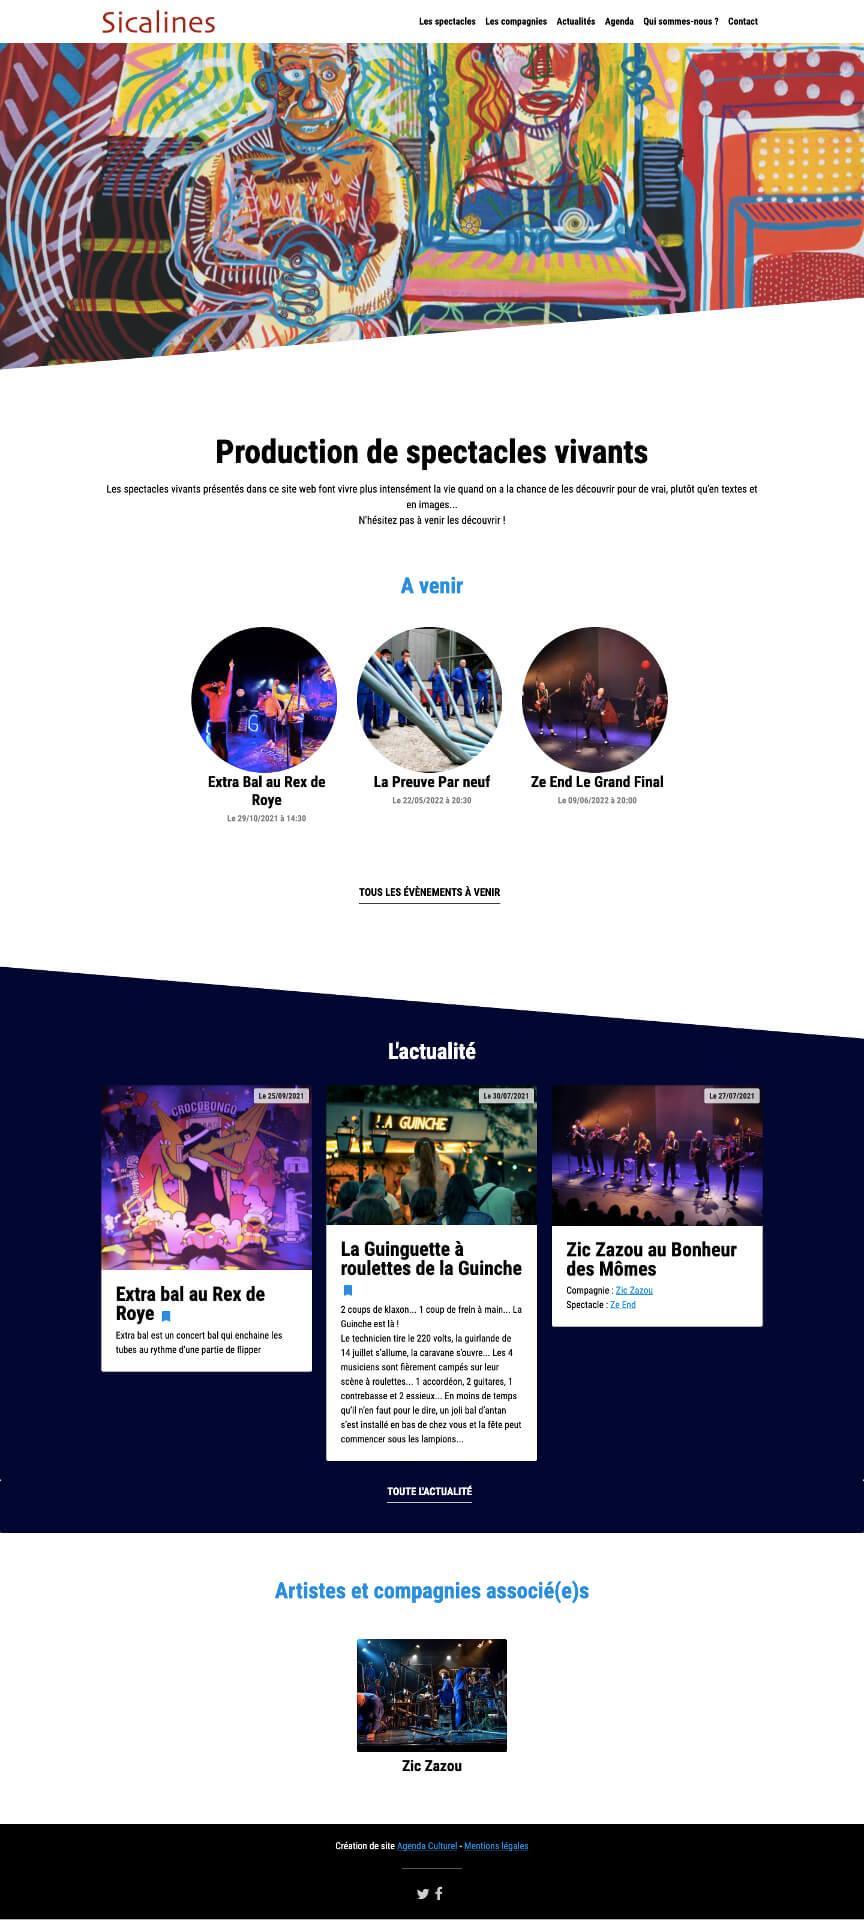 Site web sicalines